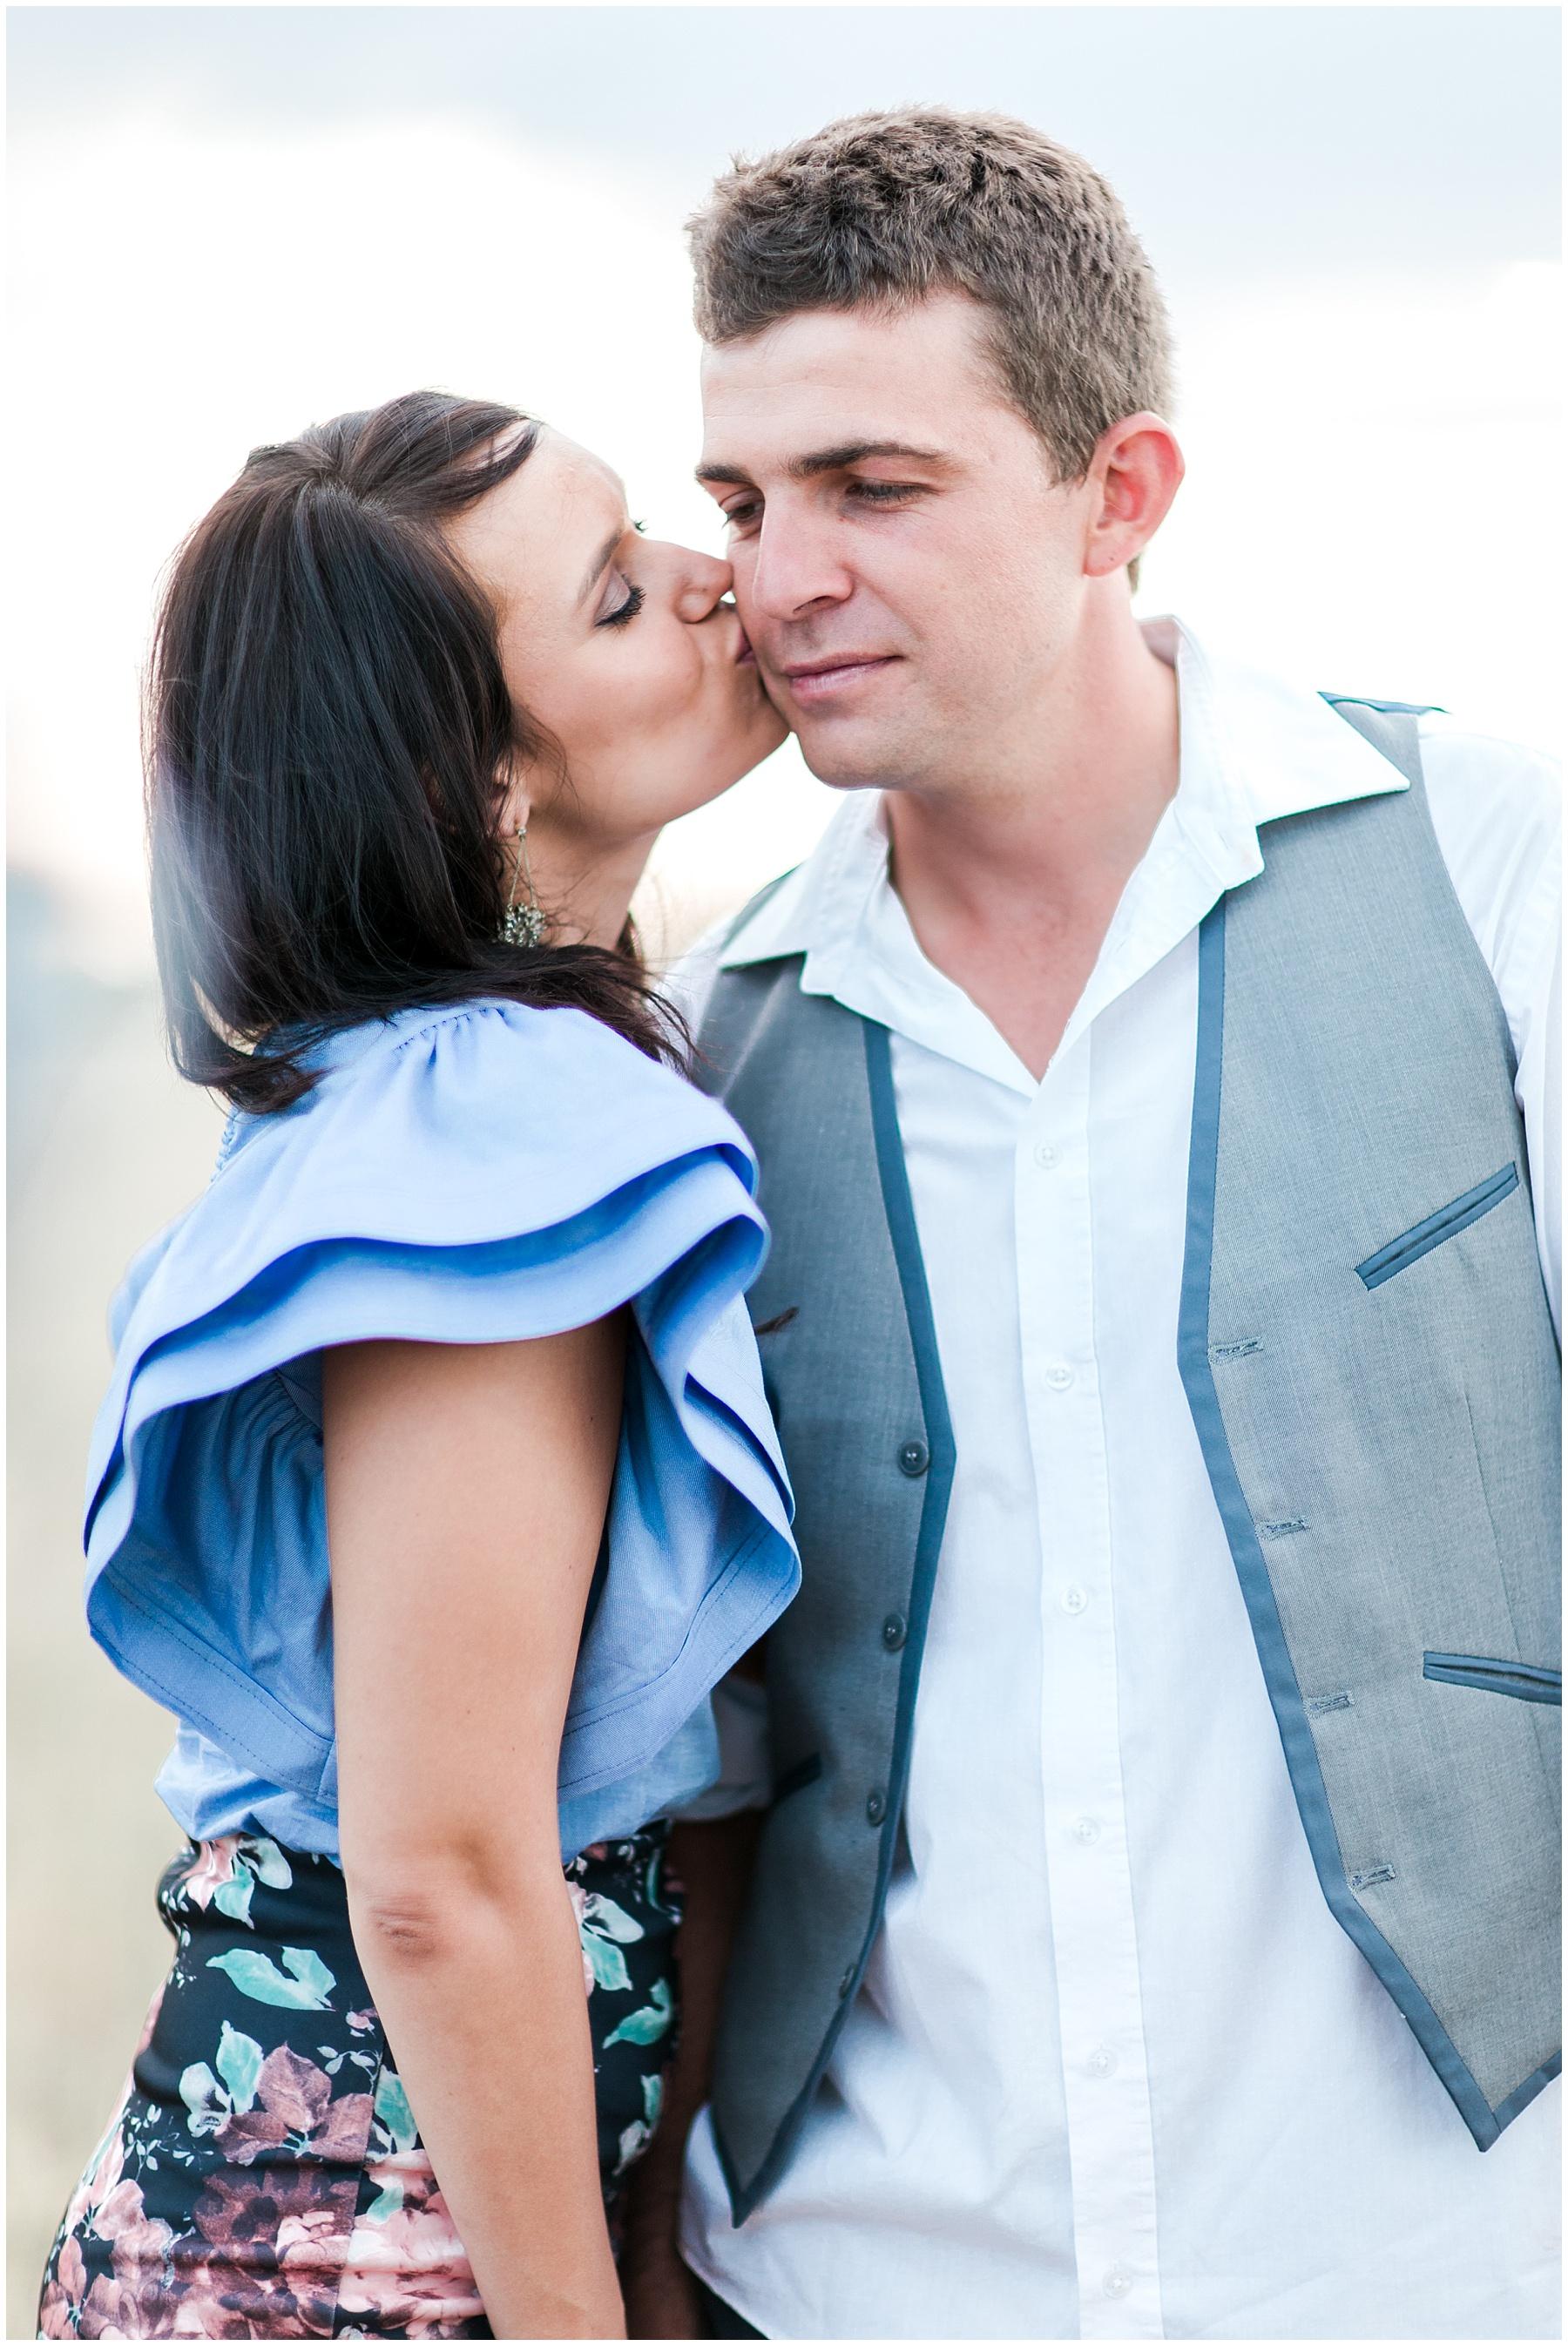 AliciaLandman_JoleneandZander_Wedding_The Pretty Blog_0387.jpg